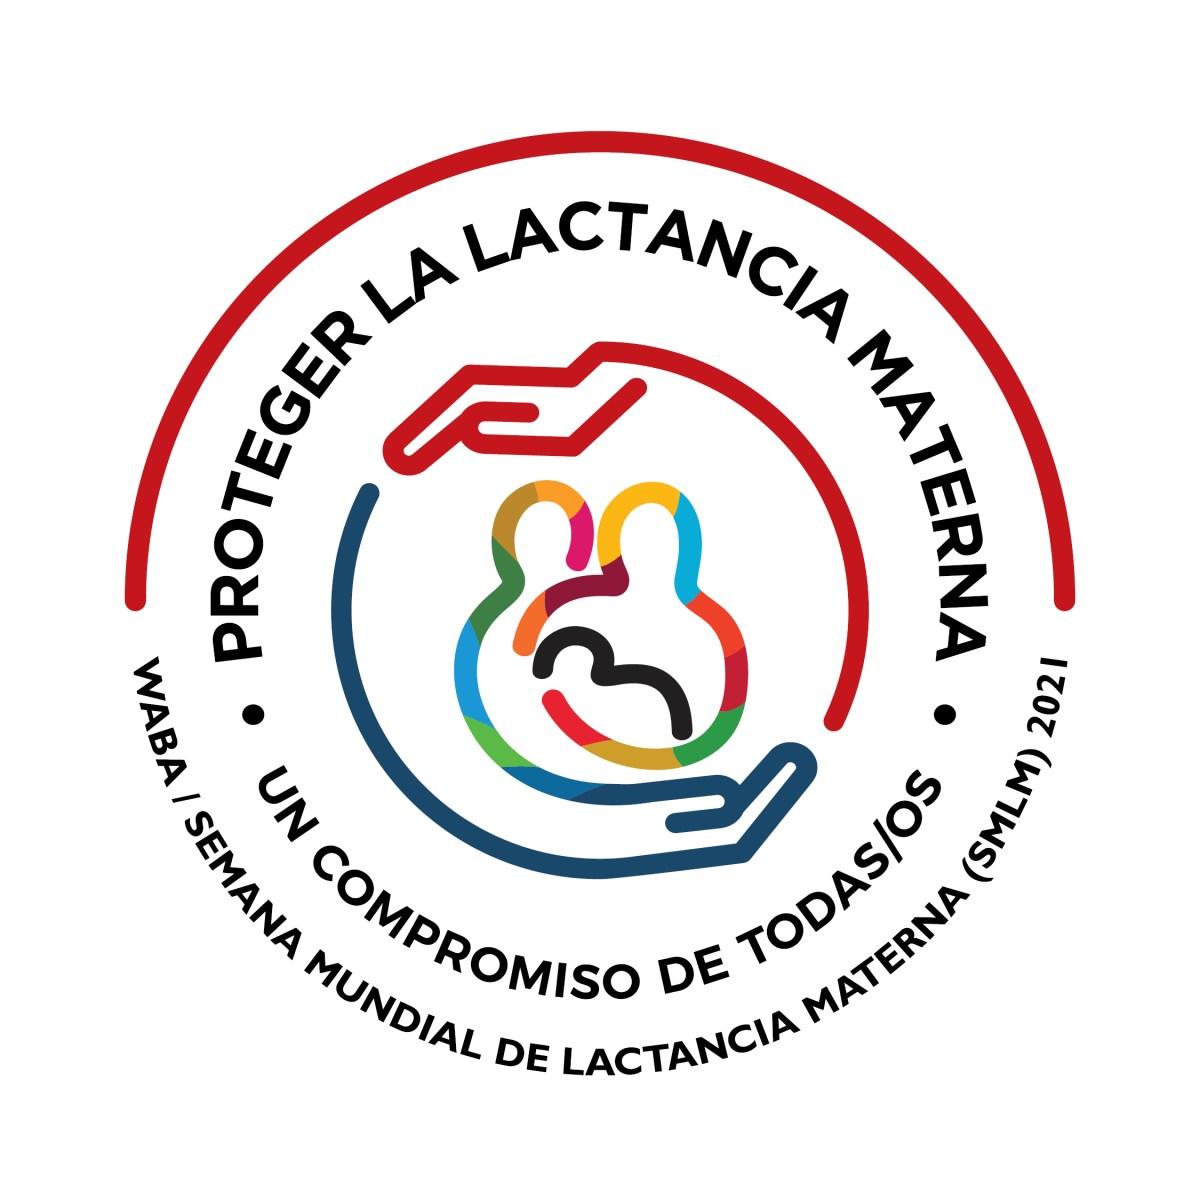 PROTEGER LA LACTANCIA MATERNA: UN COMPROMISO DE TODAS/OS. SMLM 2021